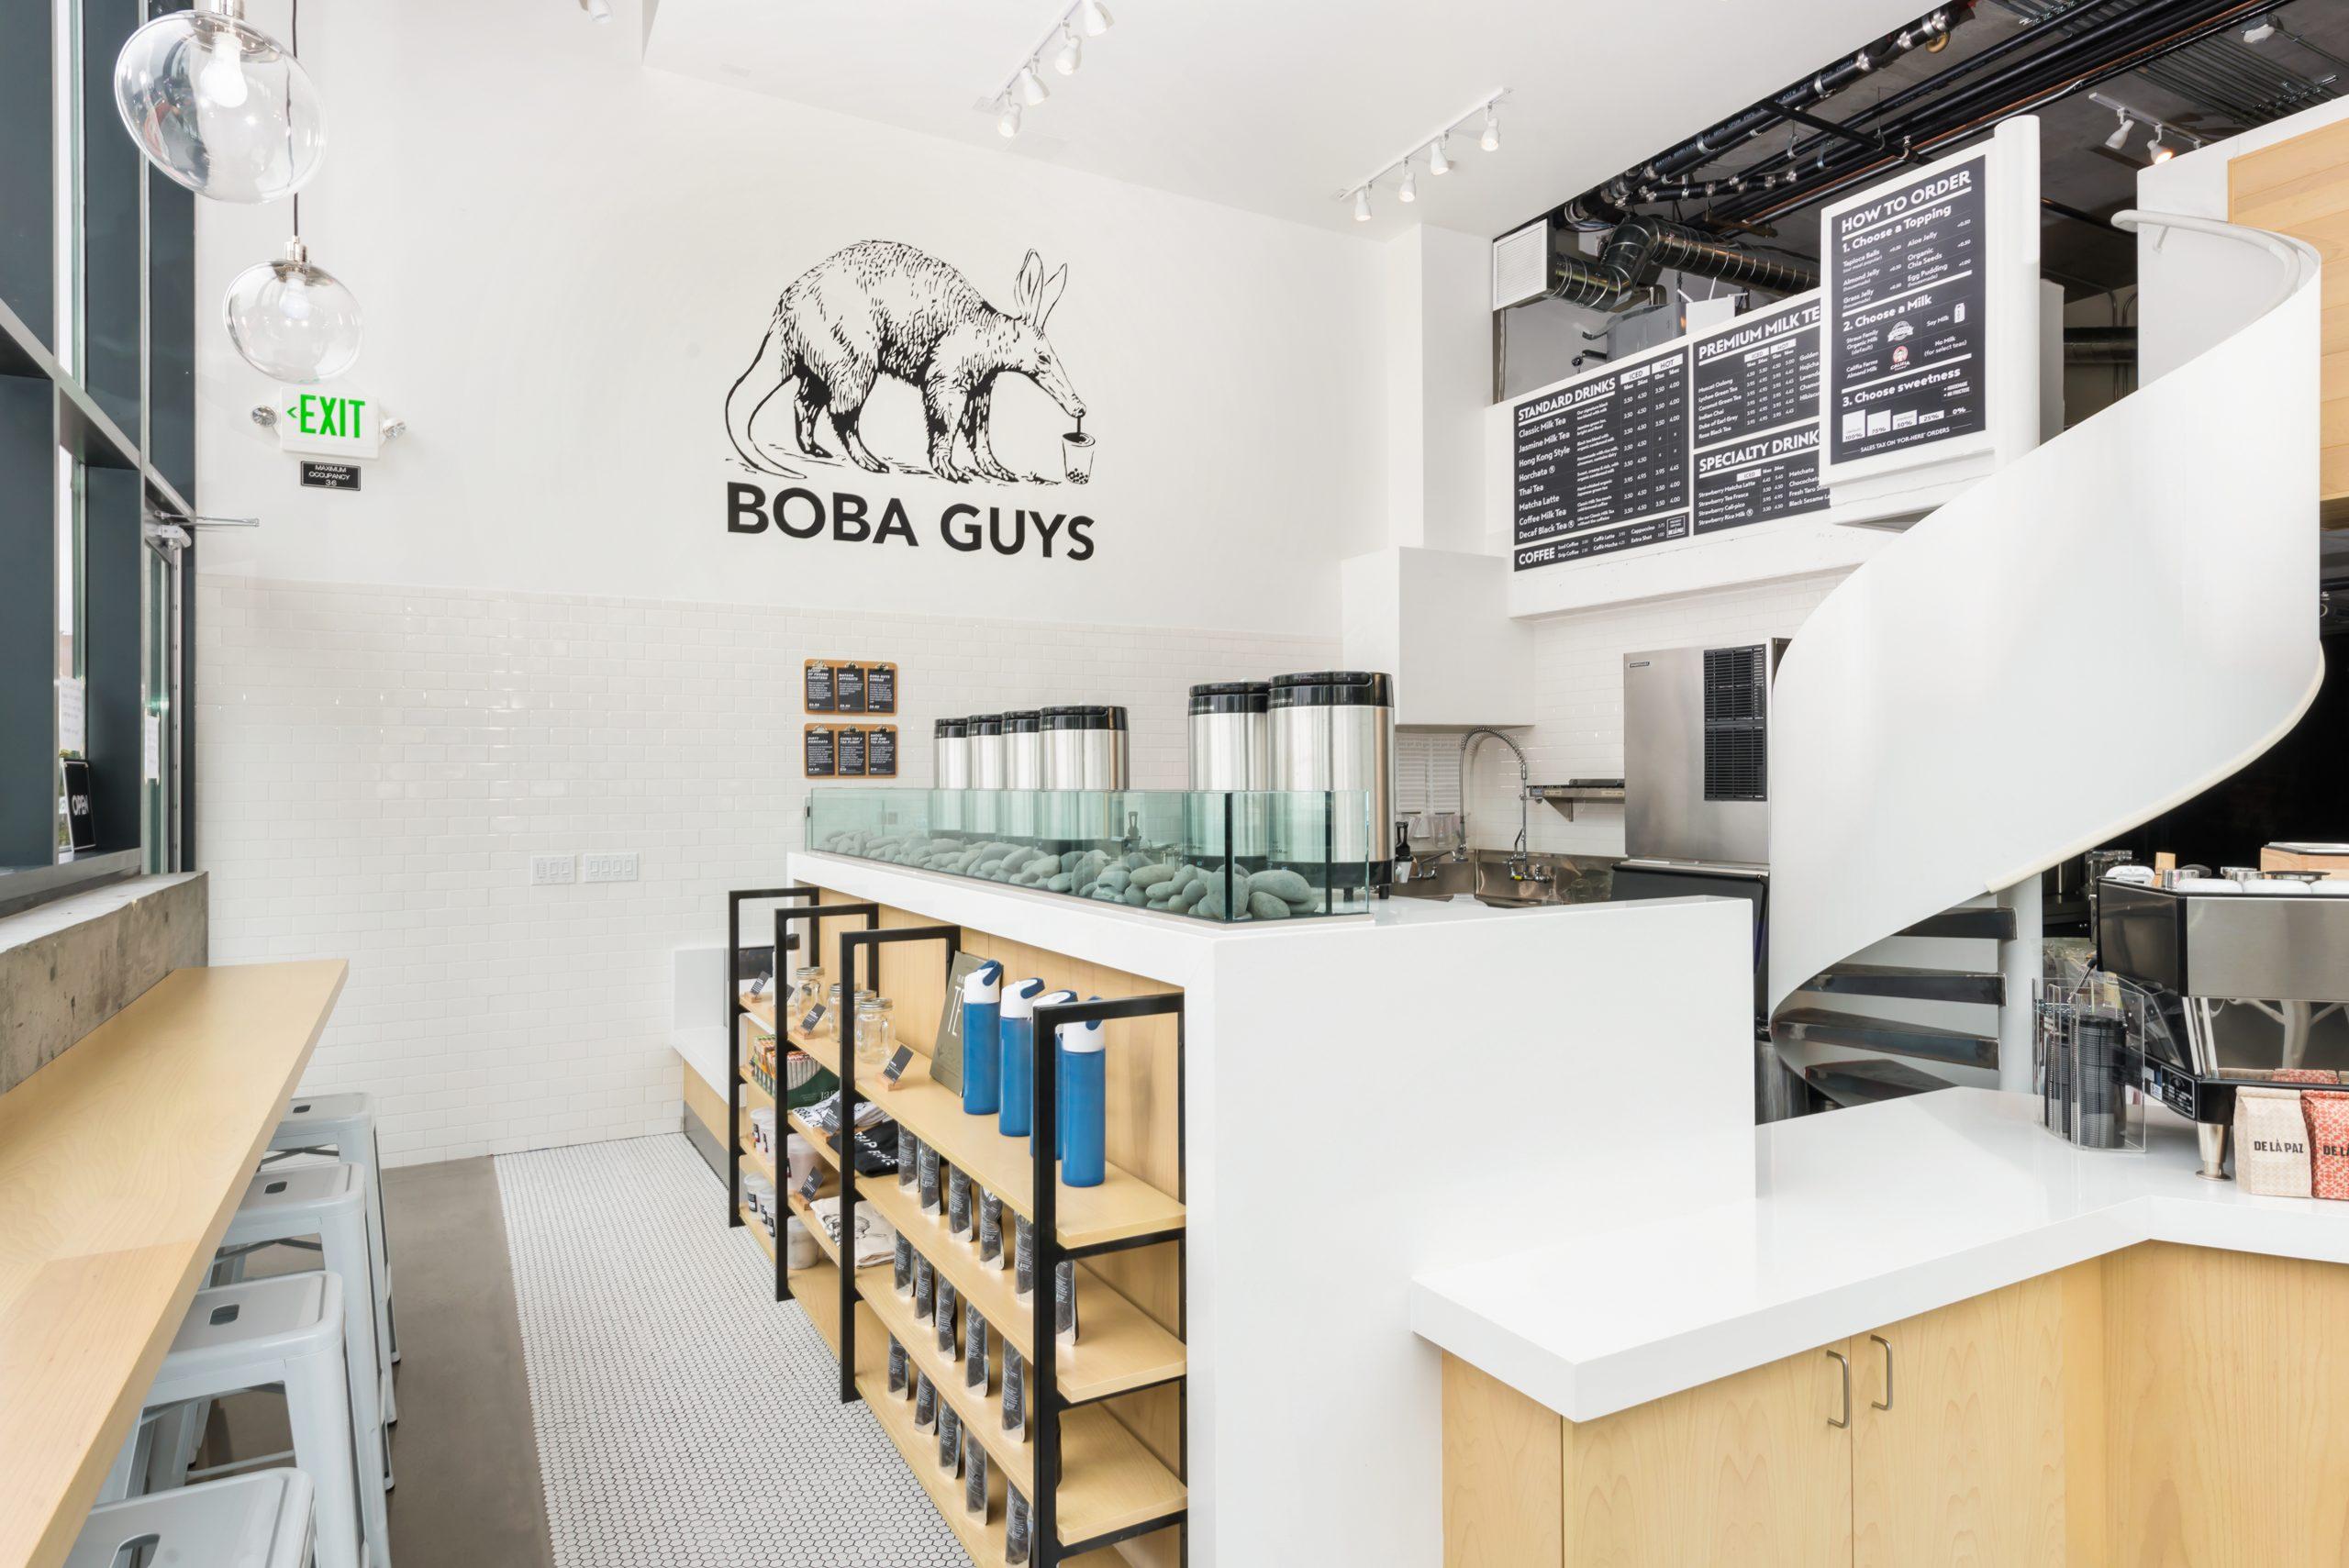 Boba-Guys-8-Octavia-Street-SF-CA-Photo-01